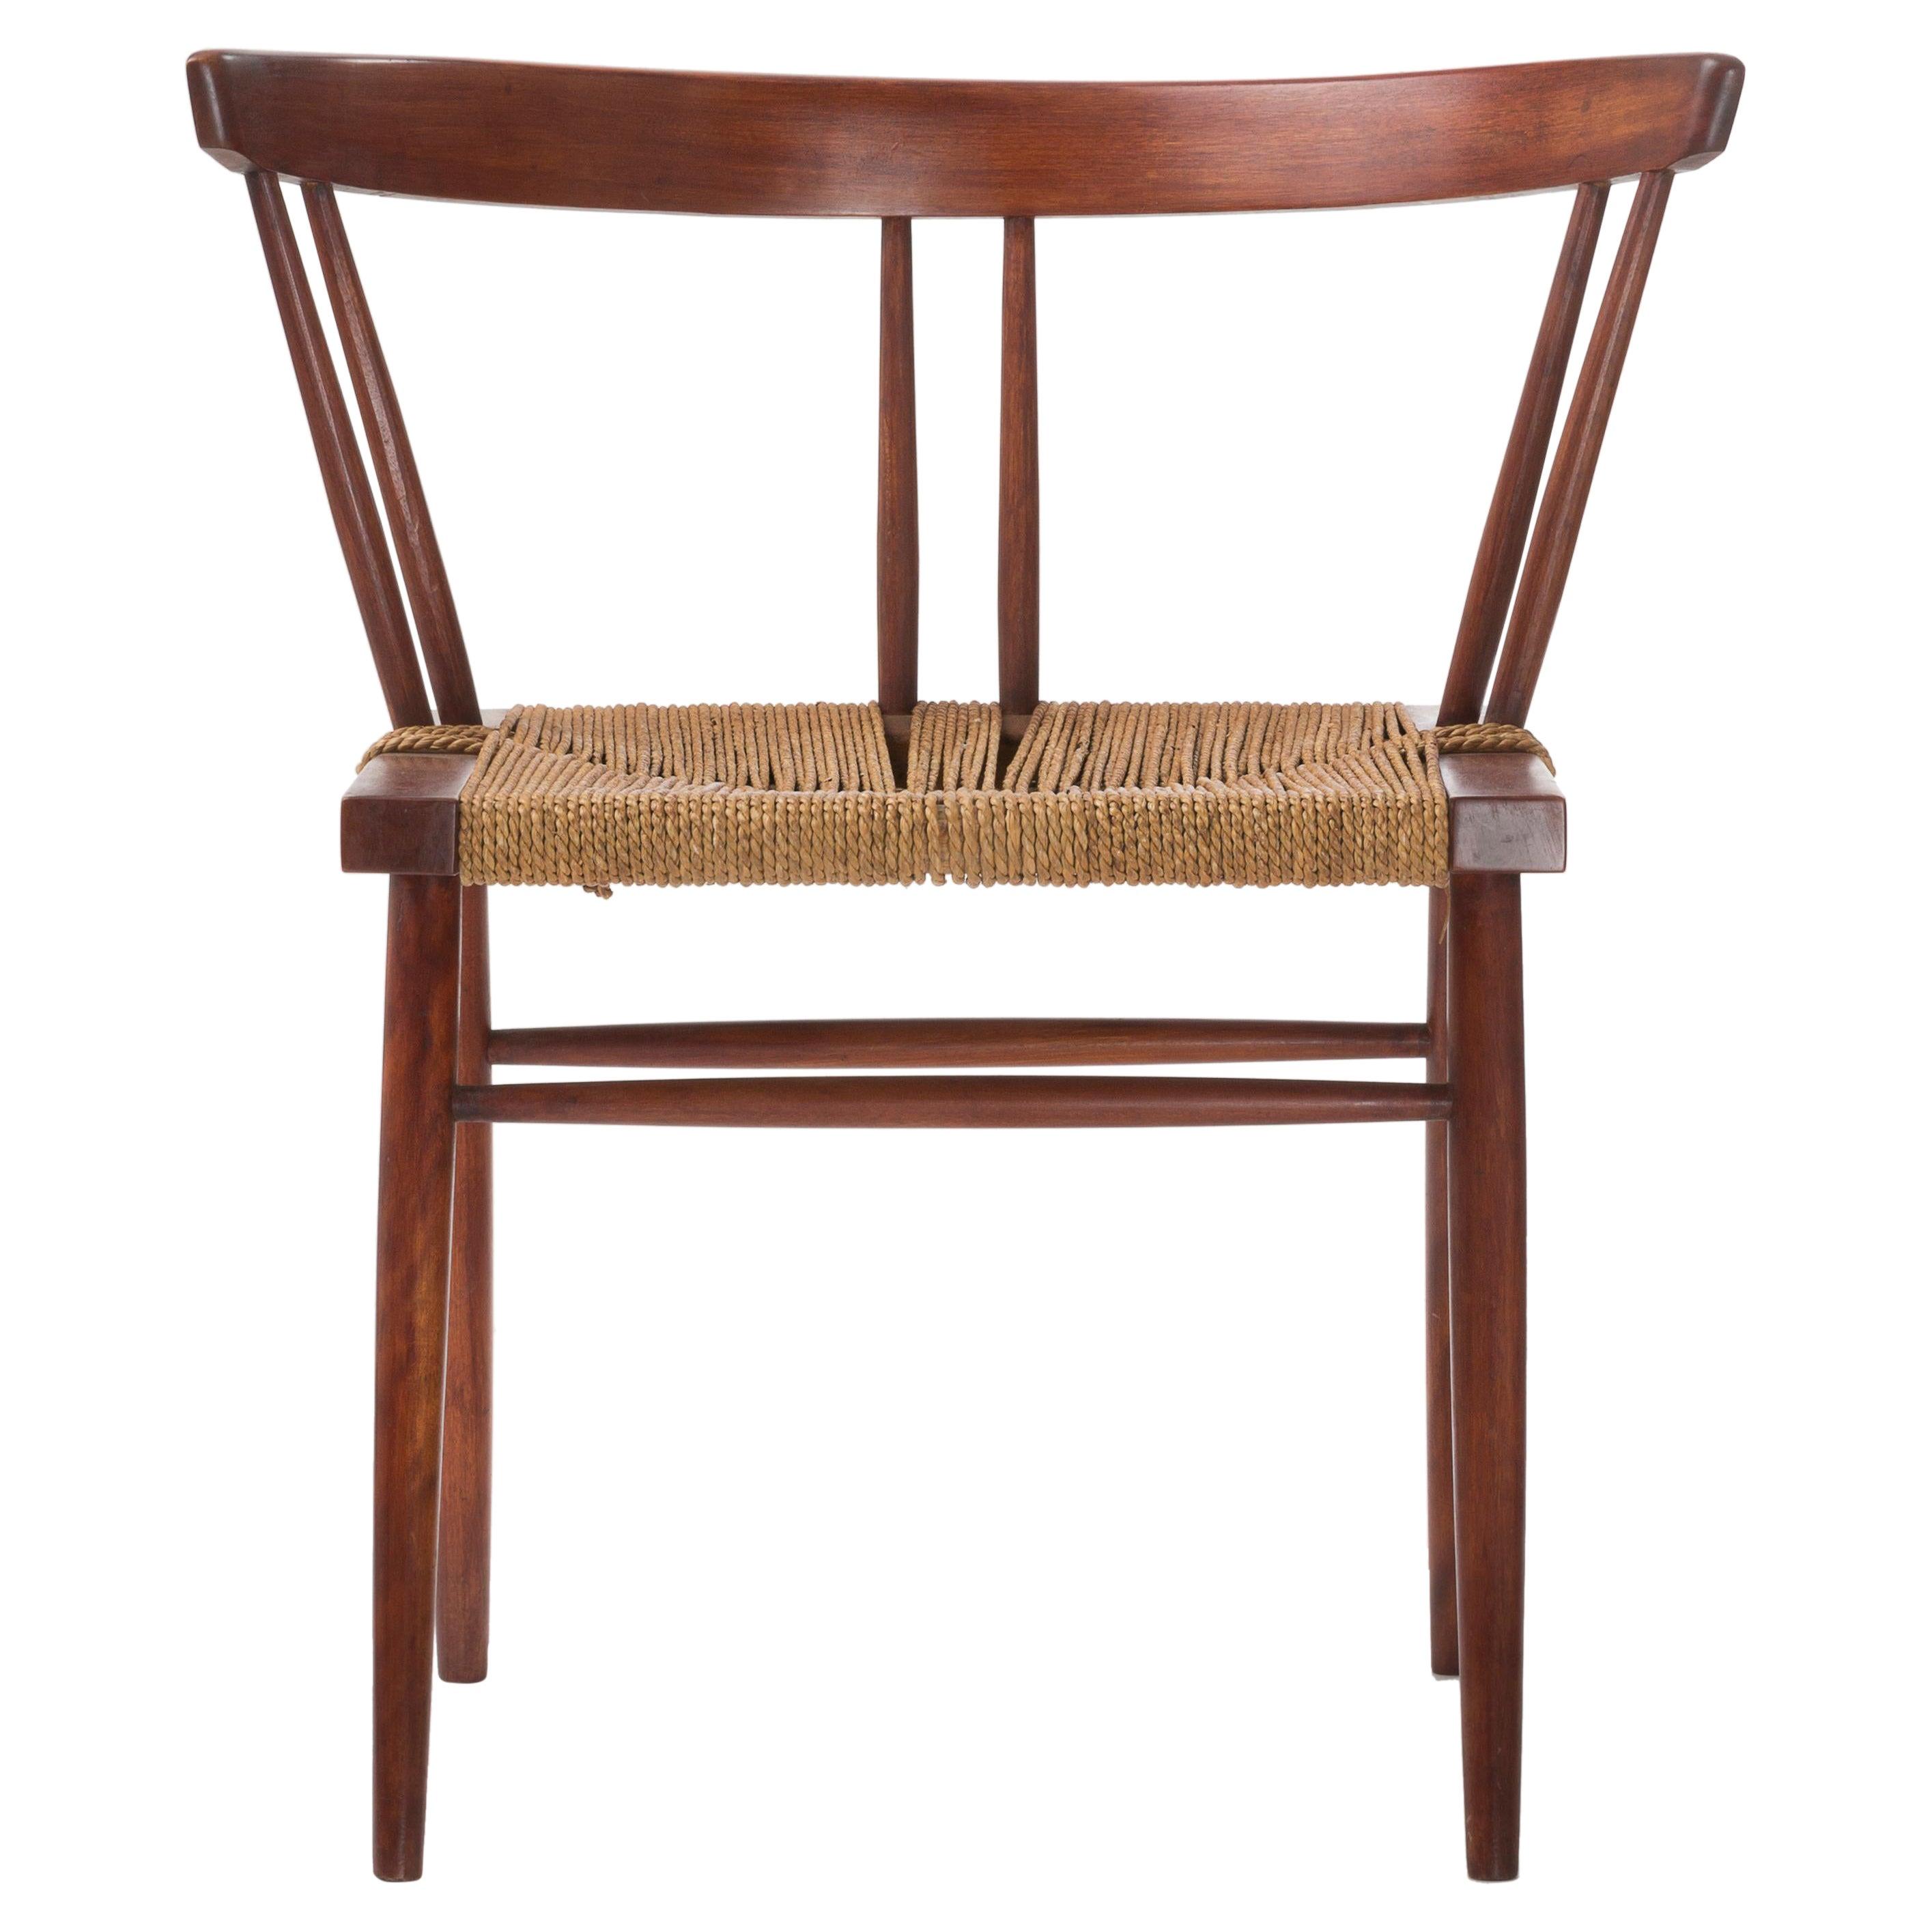 George Nakashima Grass Seated Chair, circa 1956